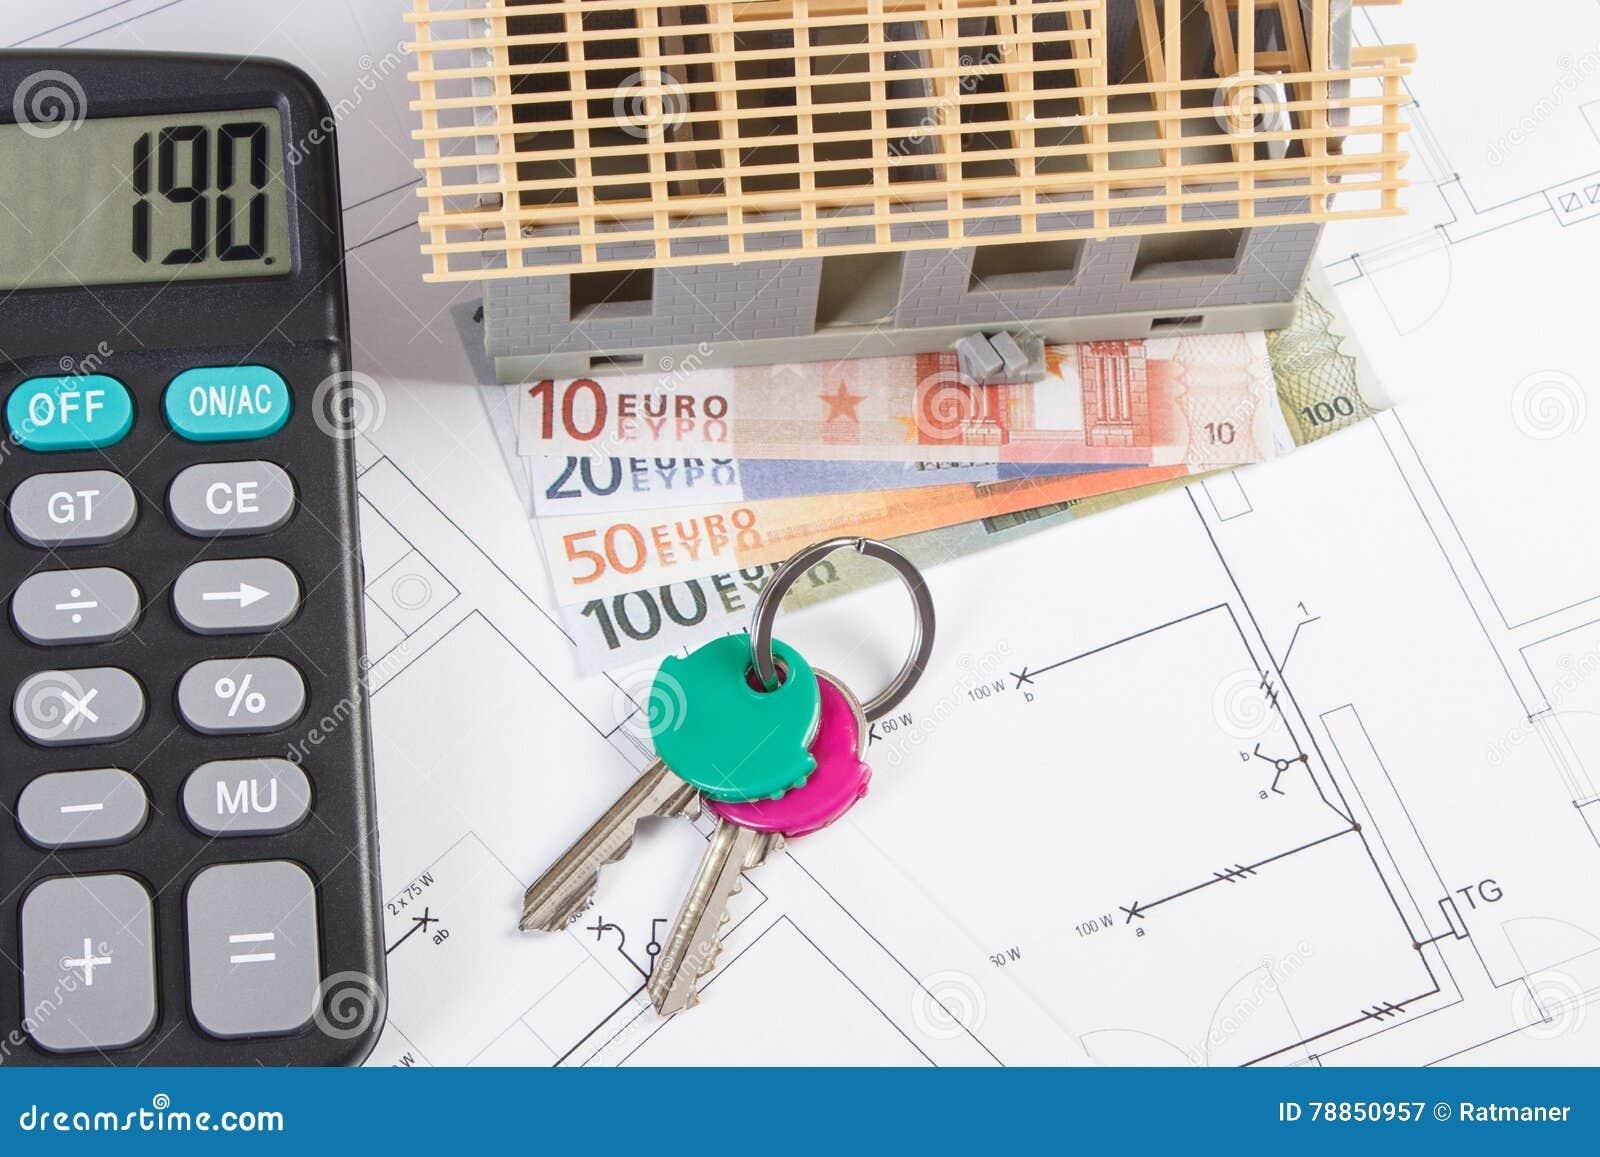 Building Home Calculator